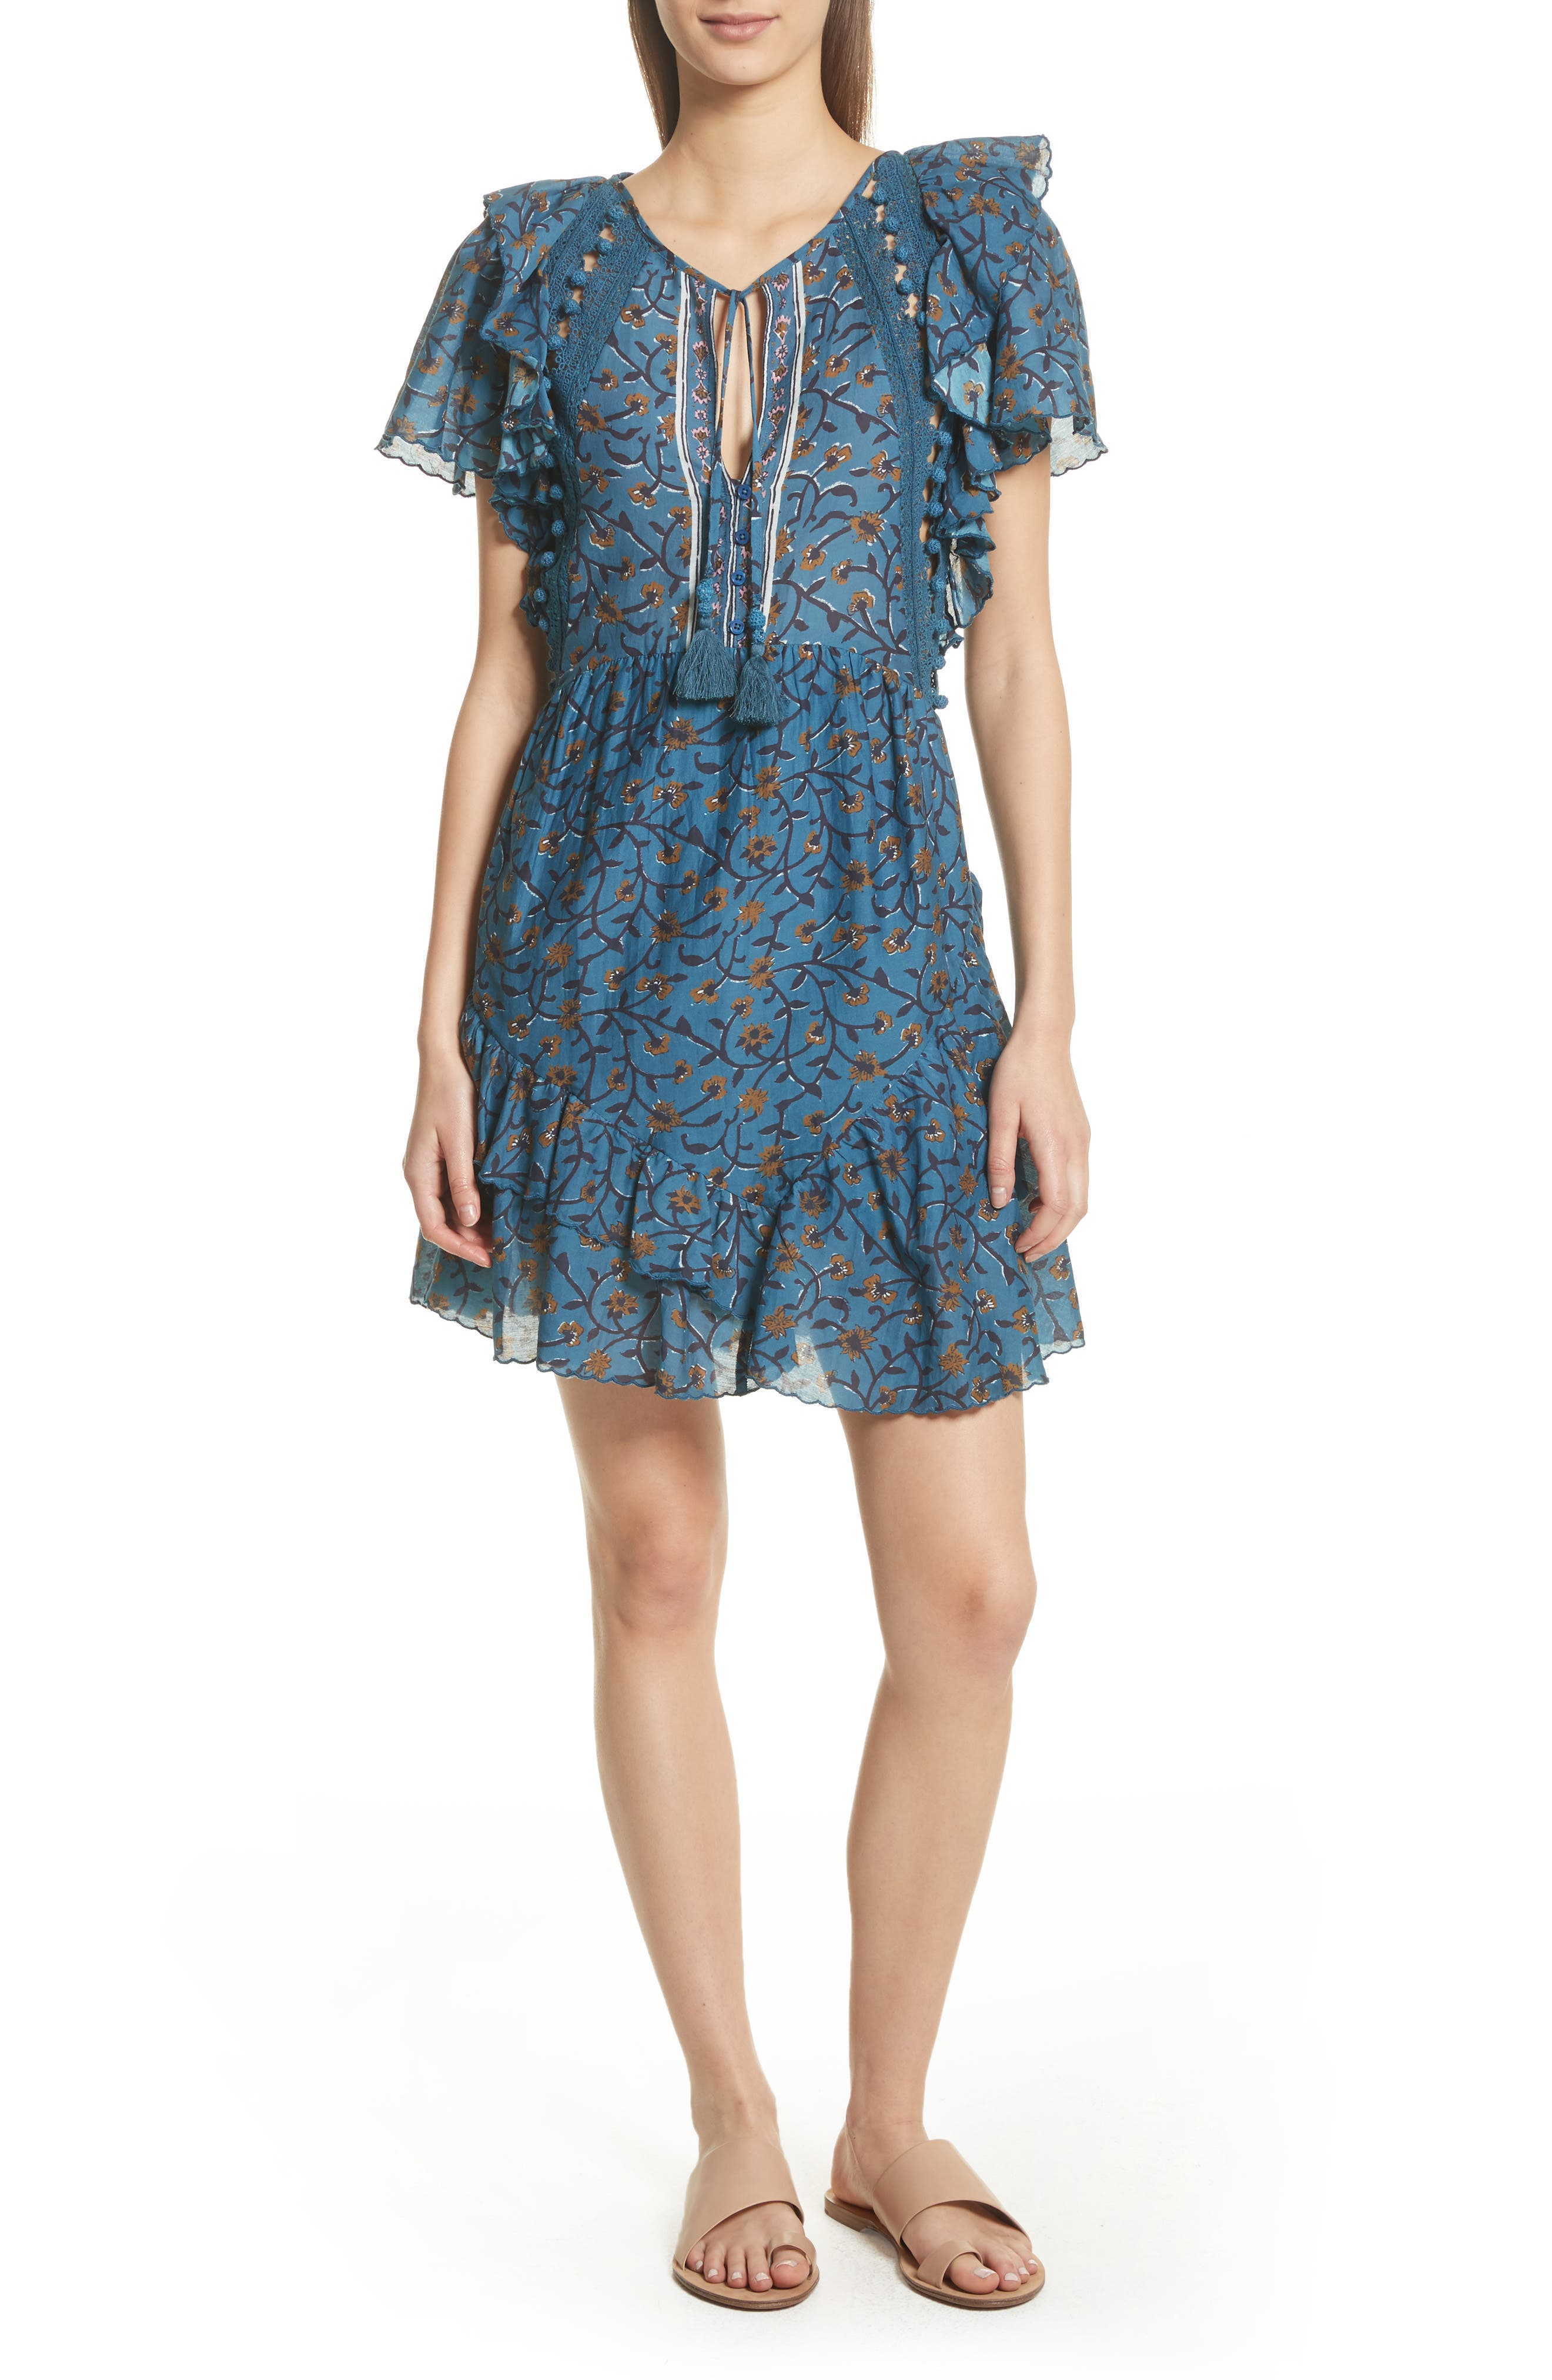 Kaylee Crochet Pompom Dress,                             Main thumbnail 1, color,                             400